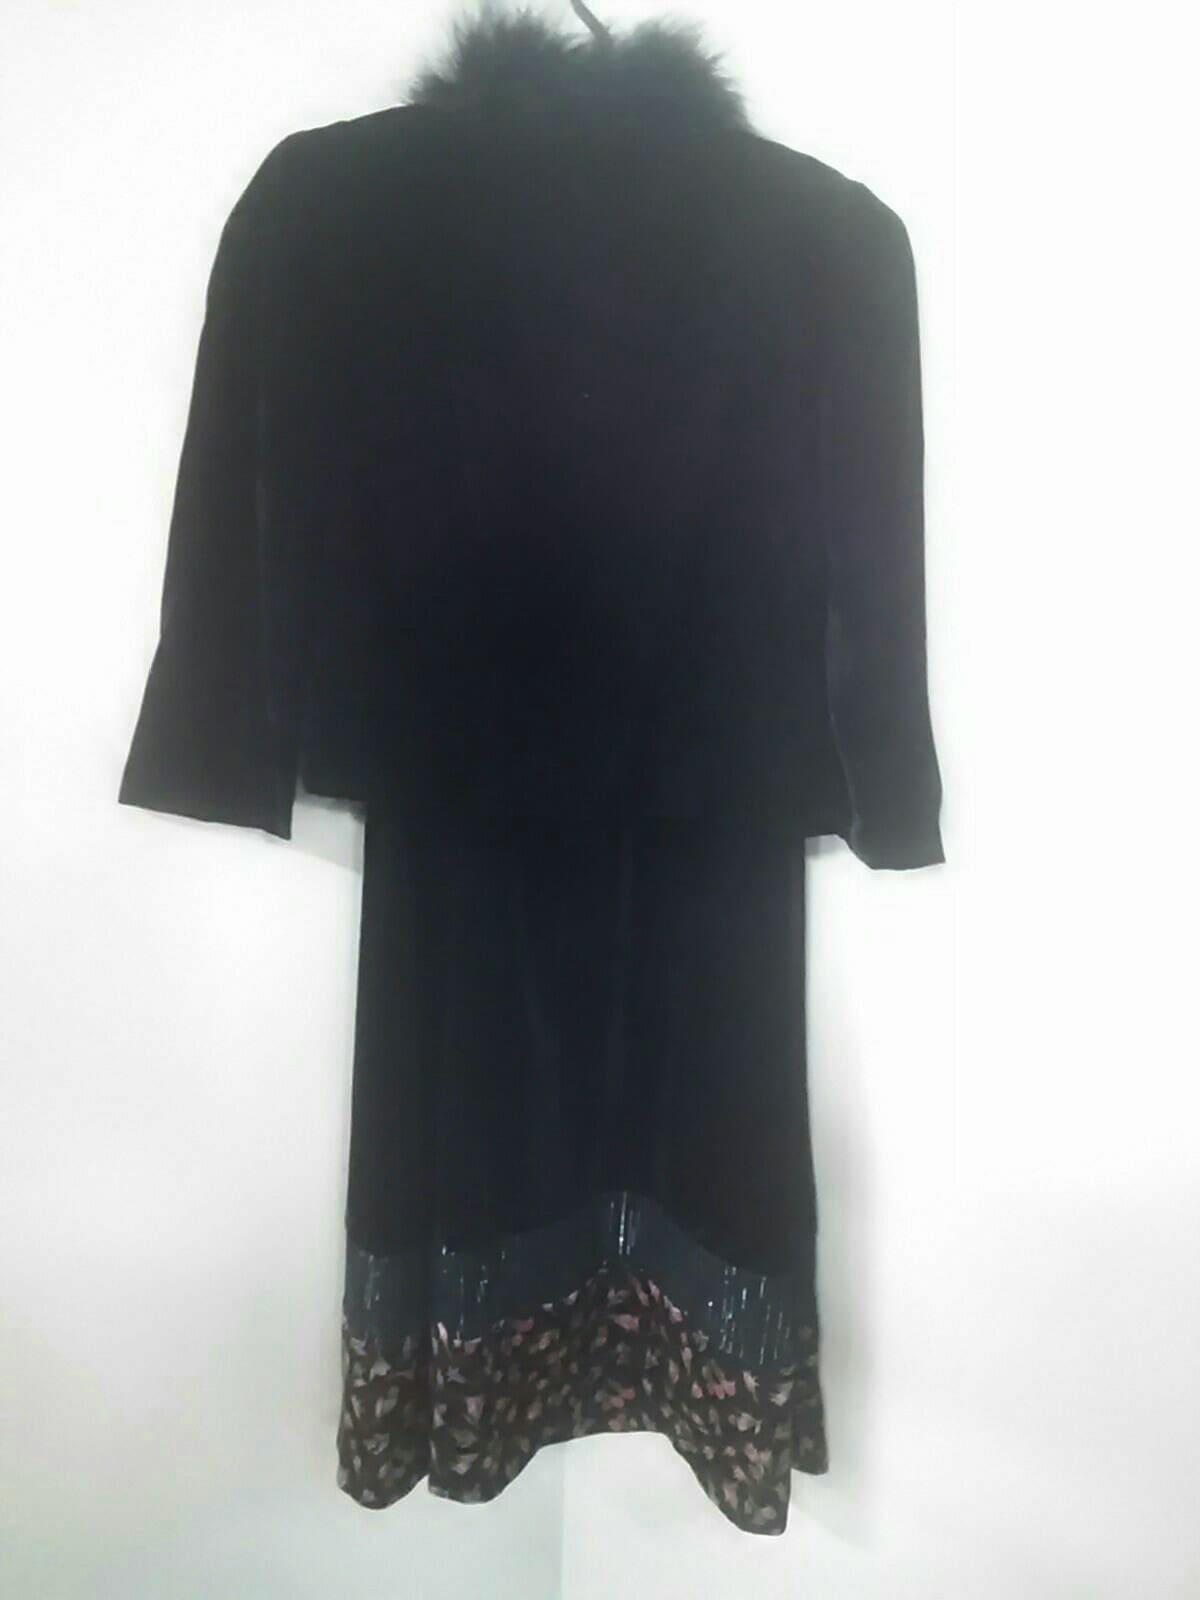 CYNTHIA ROWLEY(シンシアローリー)のワンピーススーツ